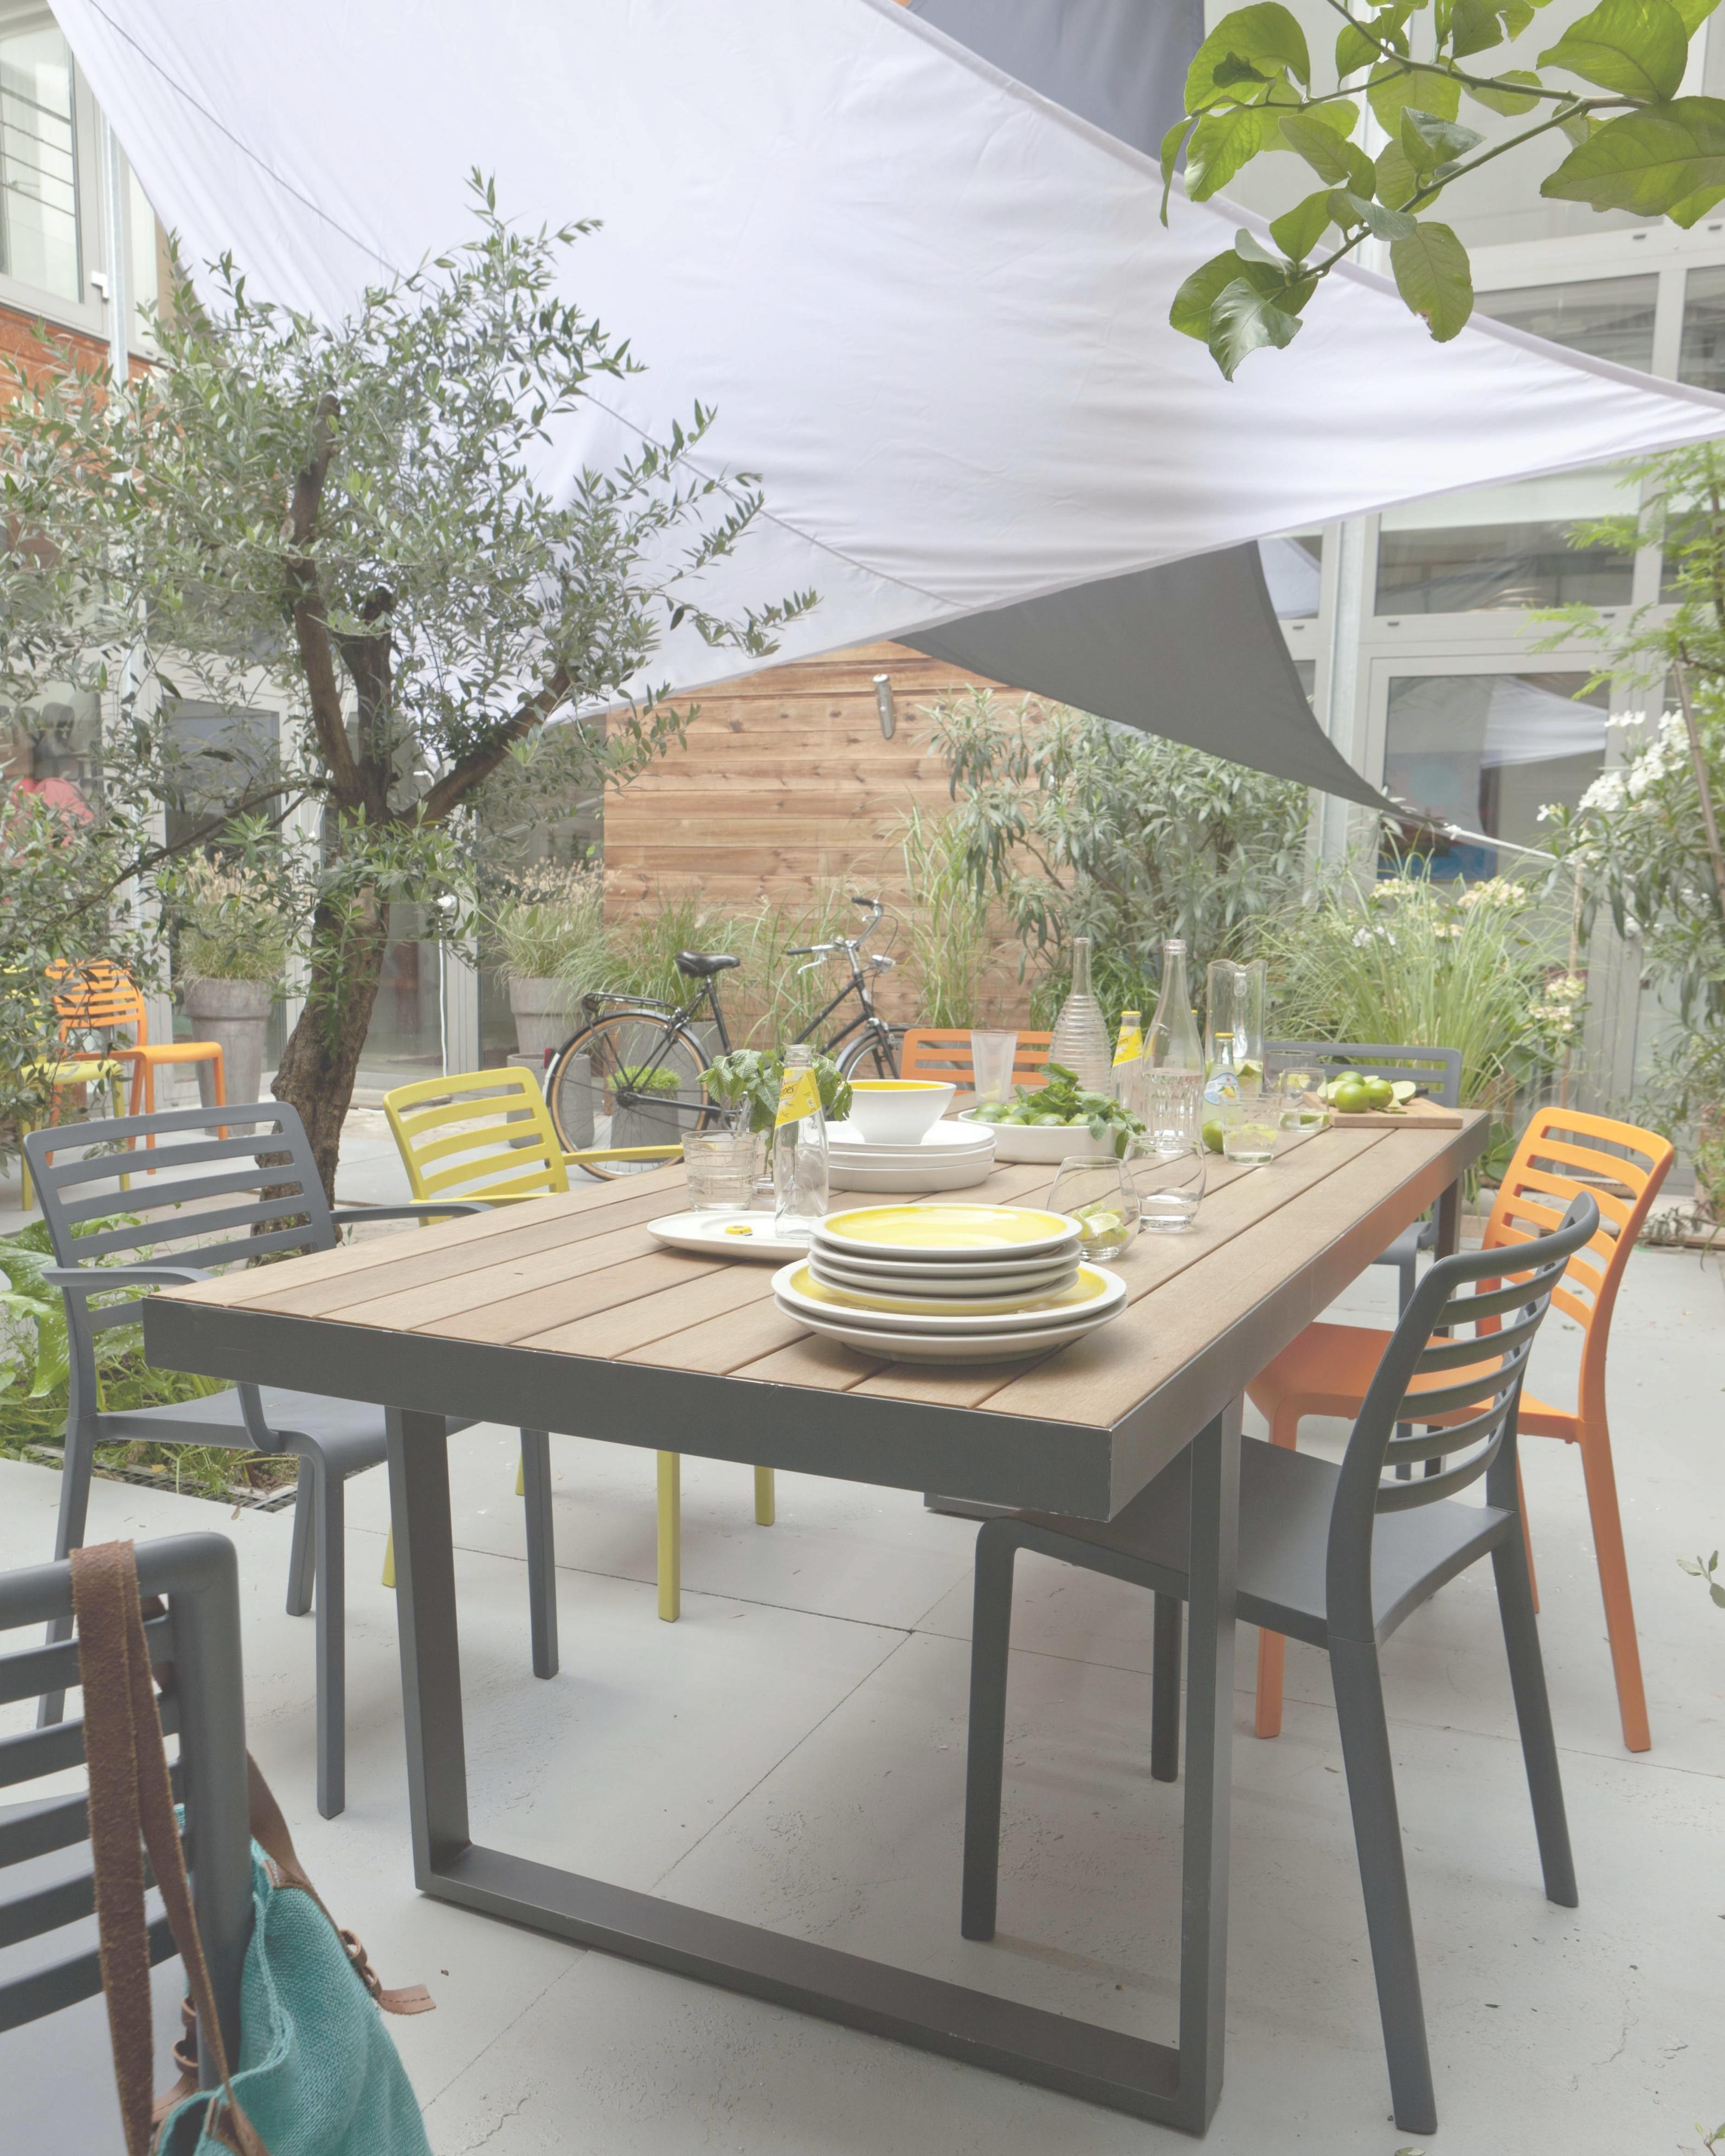 Salon de jardin a botanic - Mailleraye.fr jardin